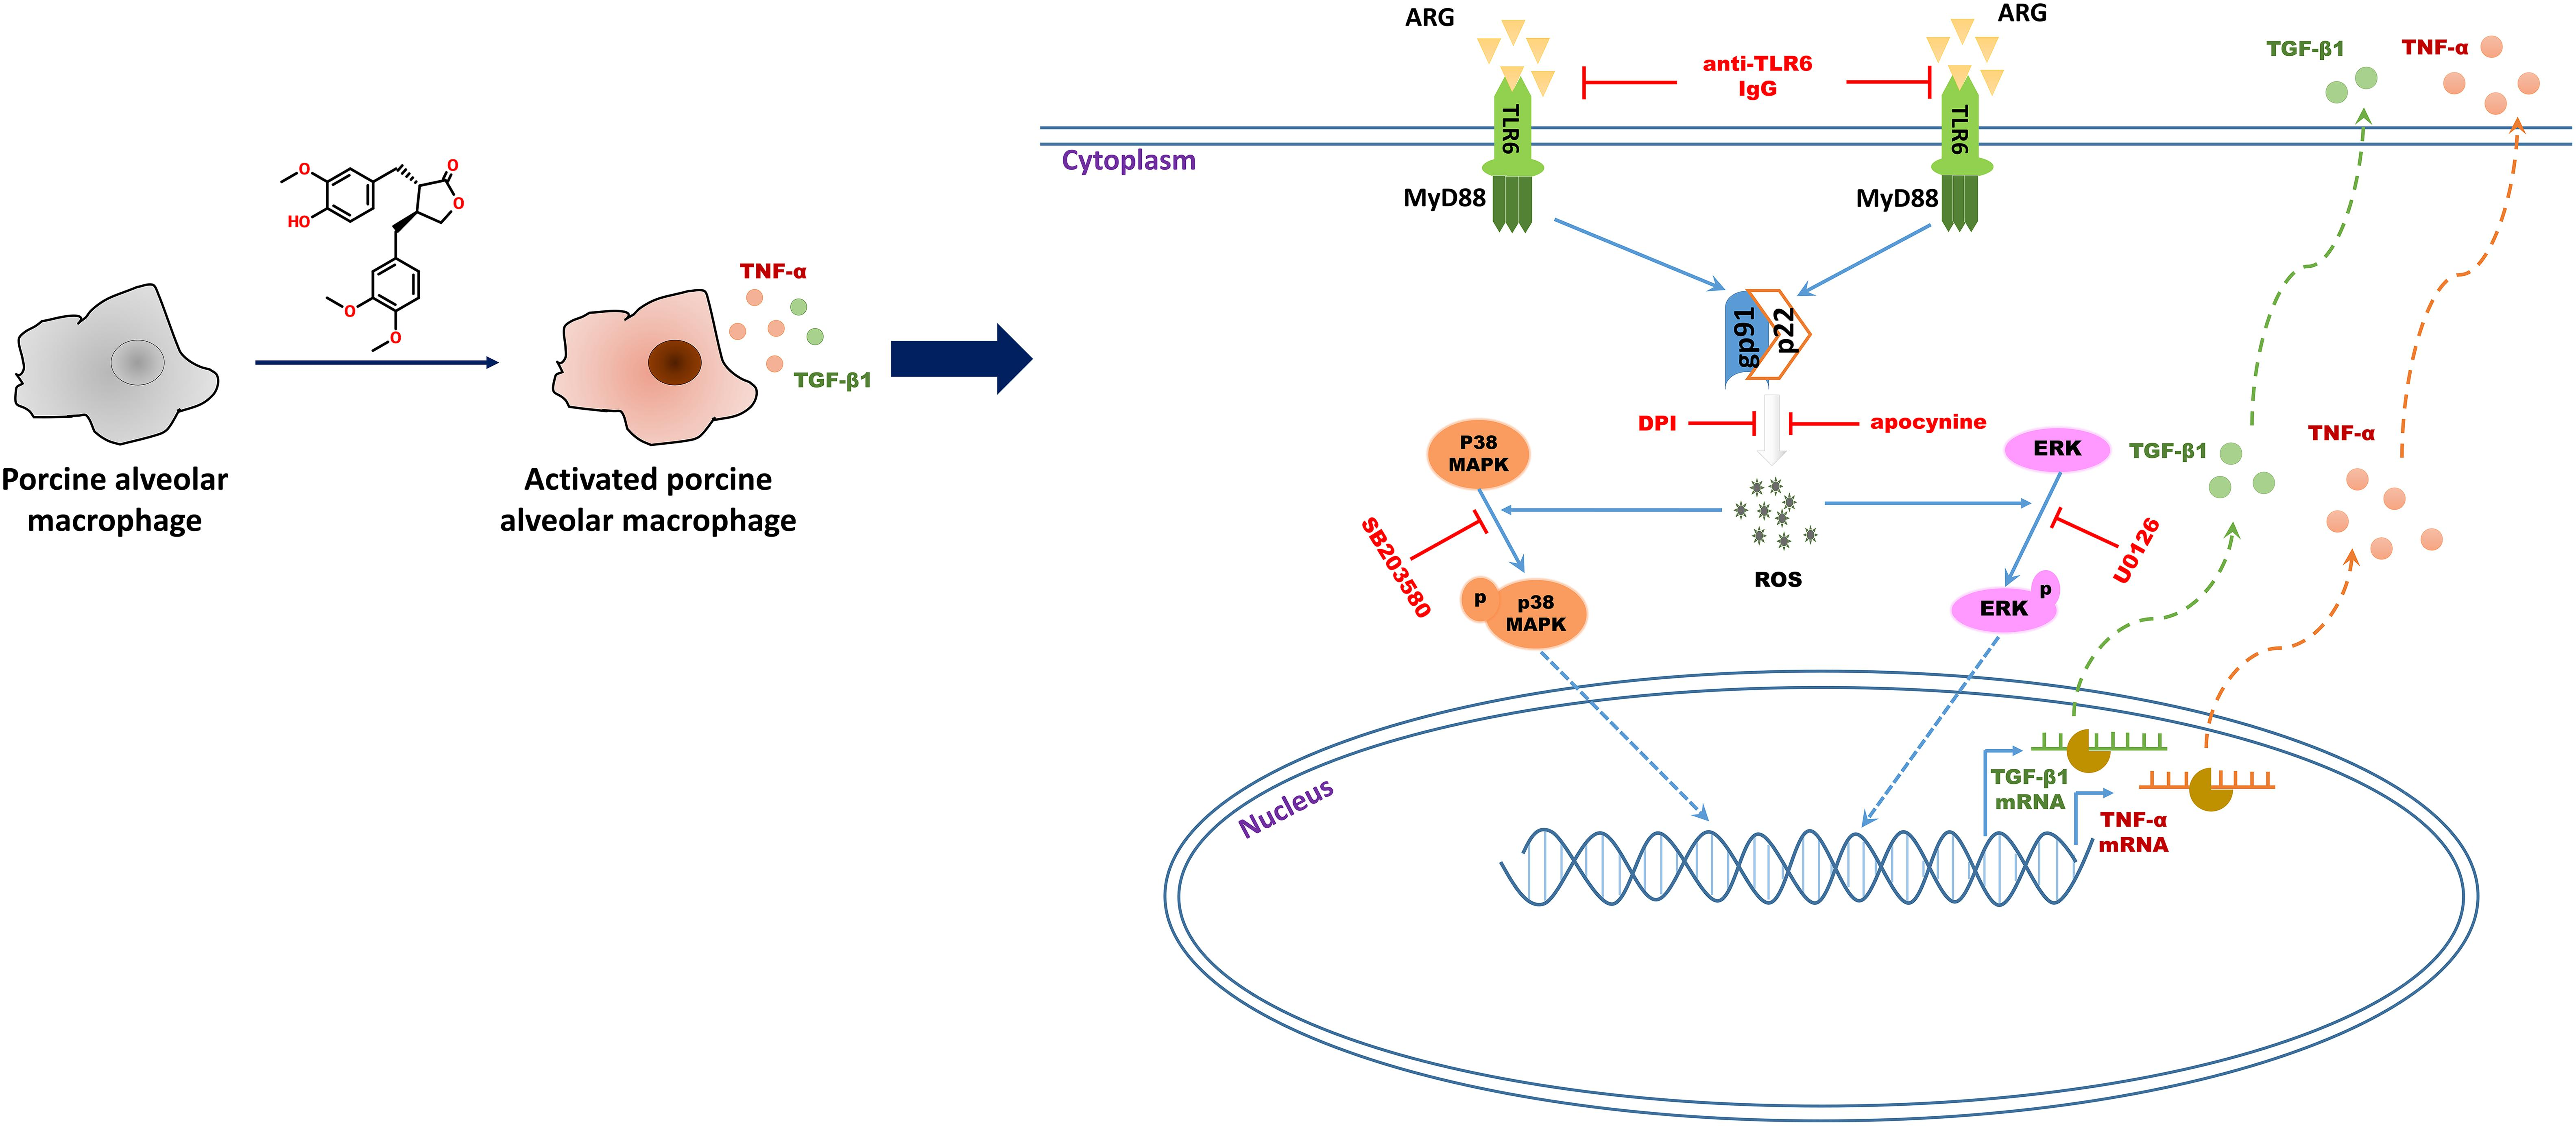 Frontiers | Arctigenin Induces an Activation Response in